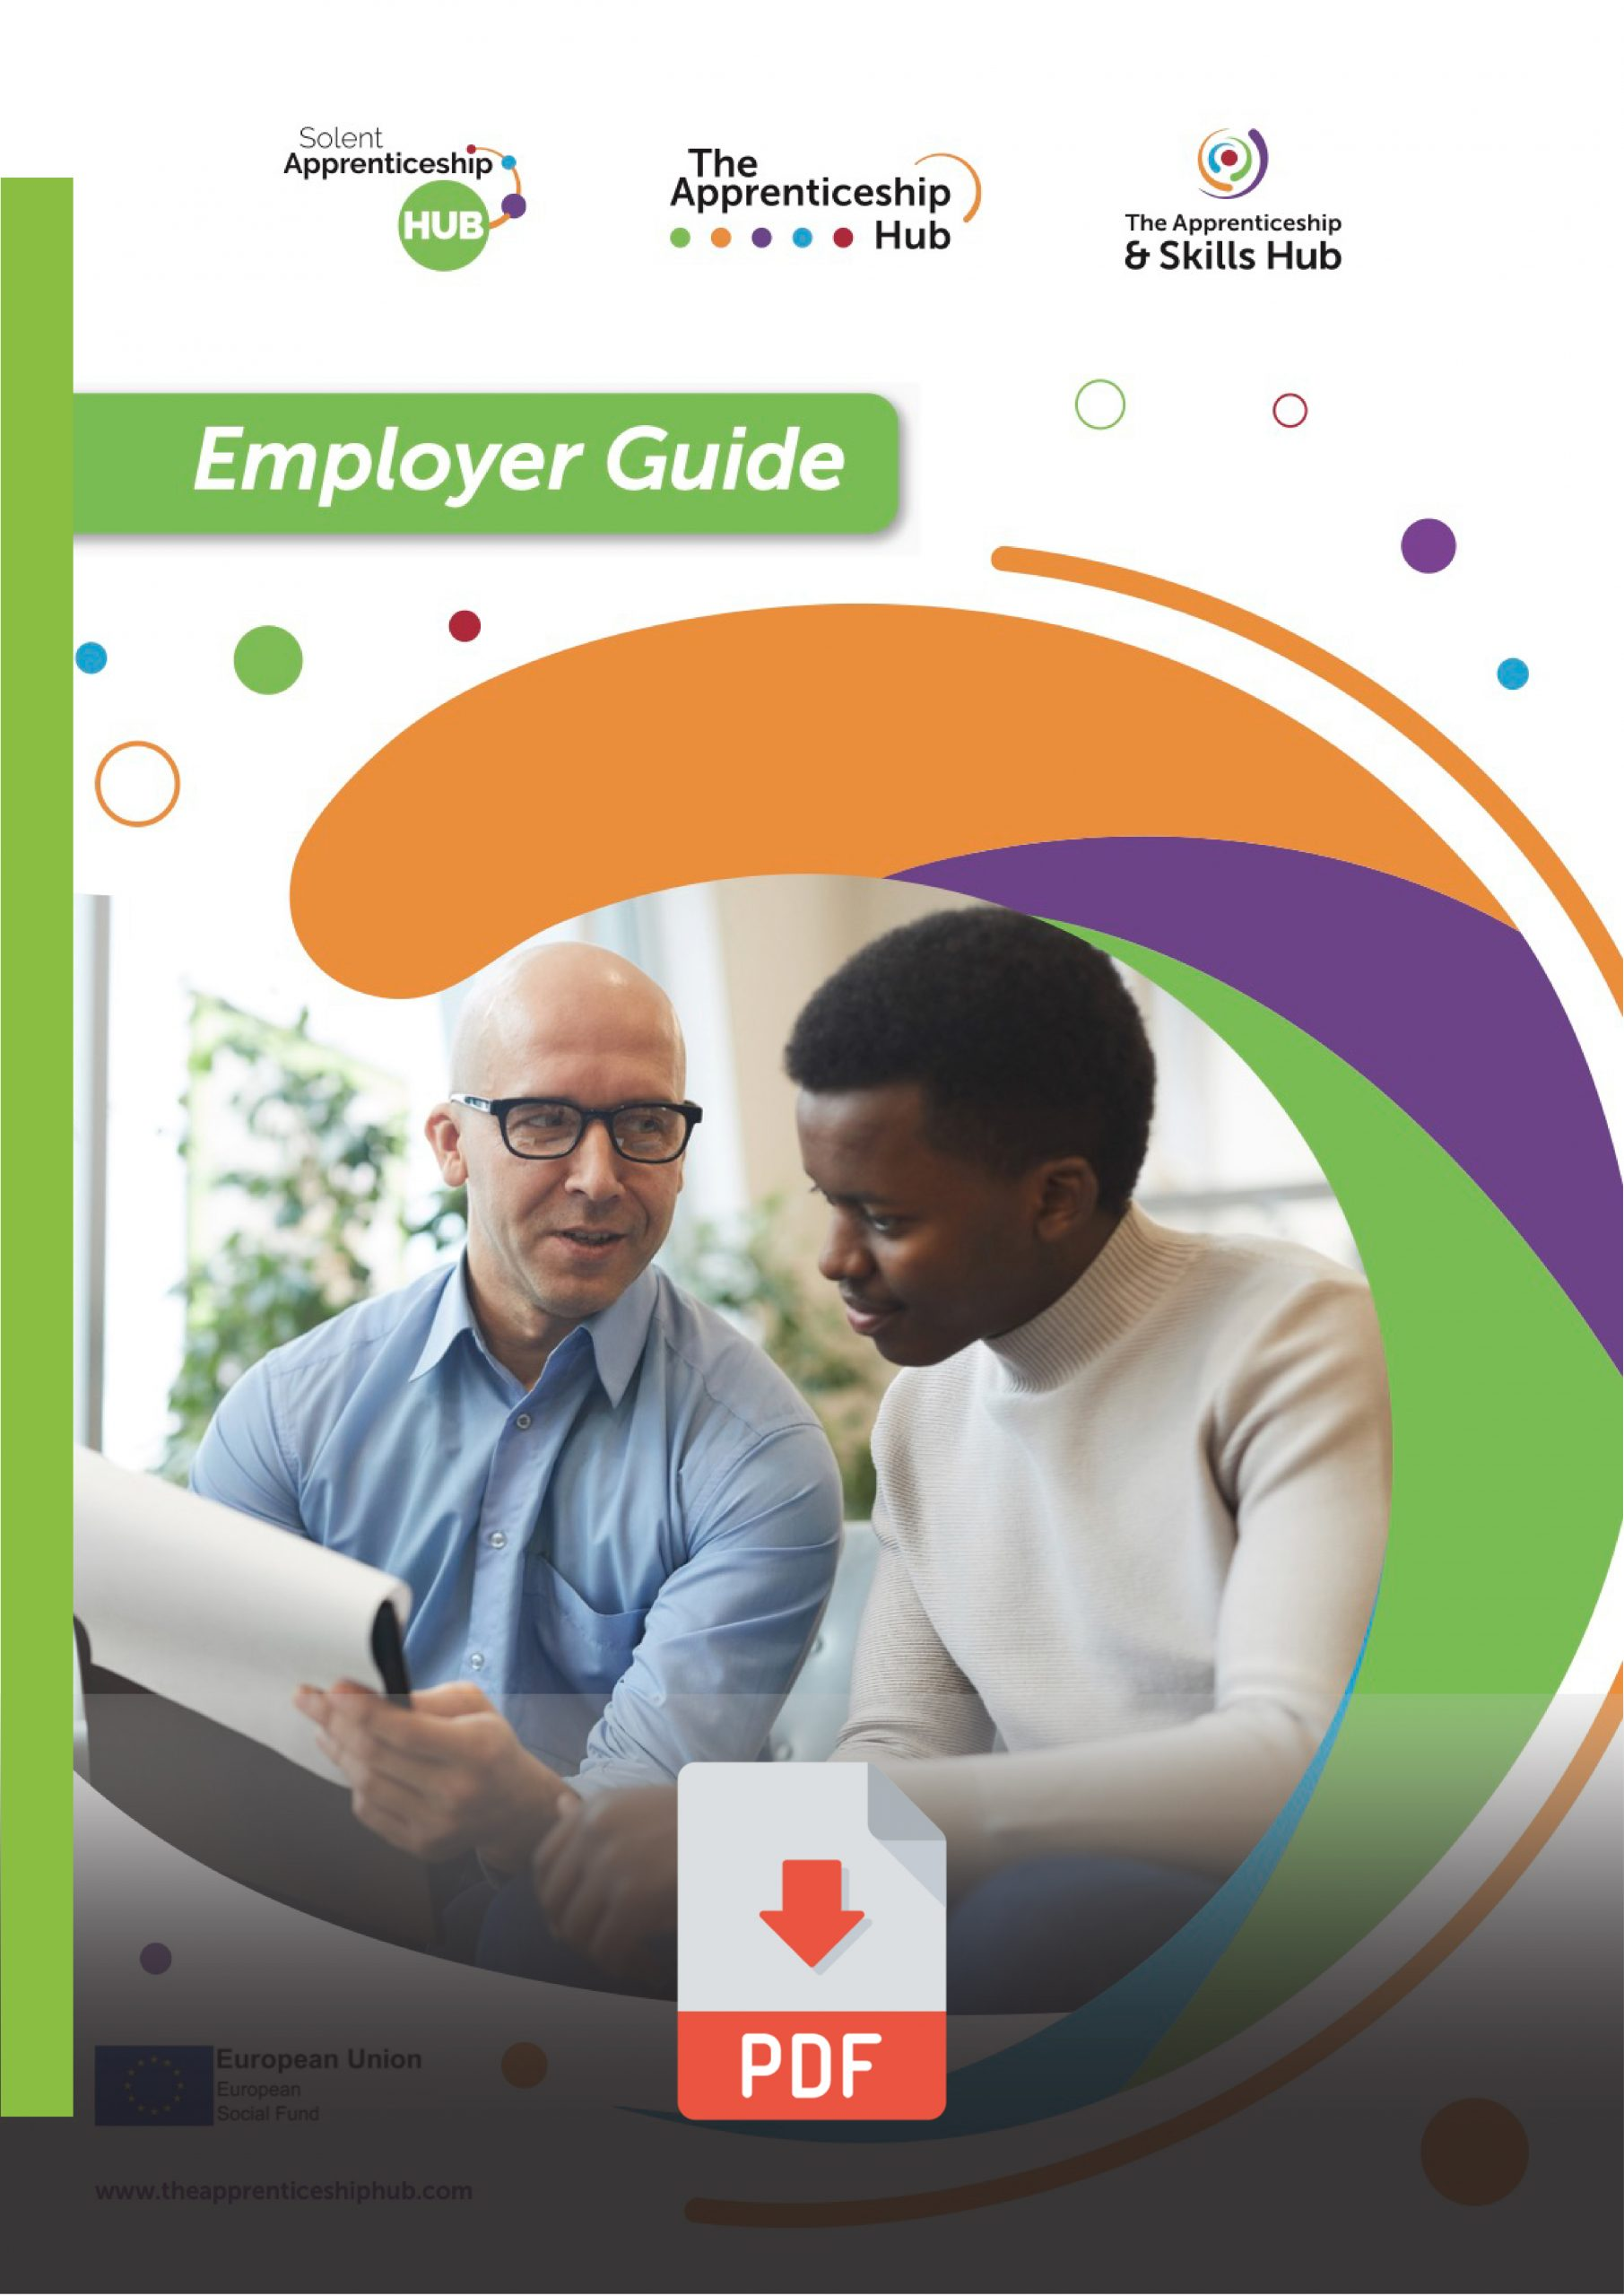 Employer Guide - The Apprenticeship Hub